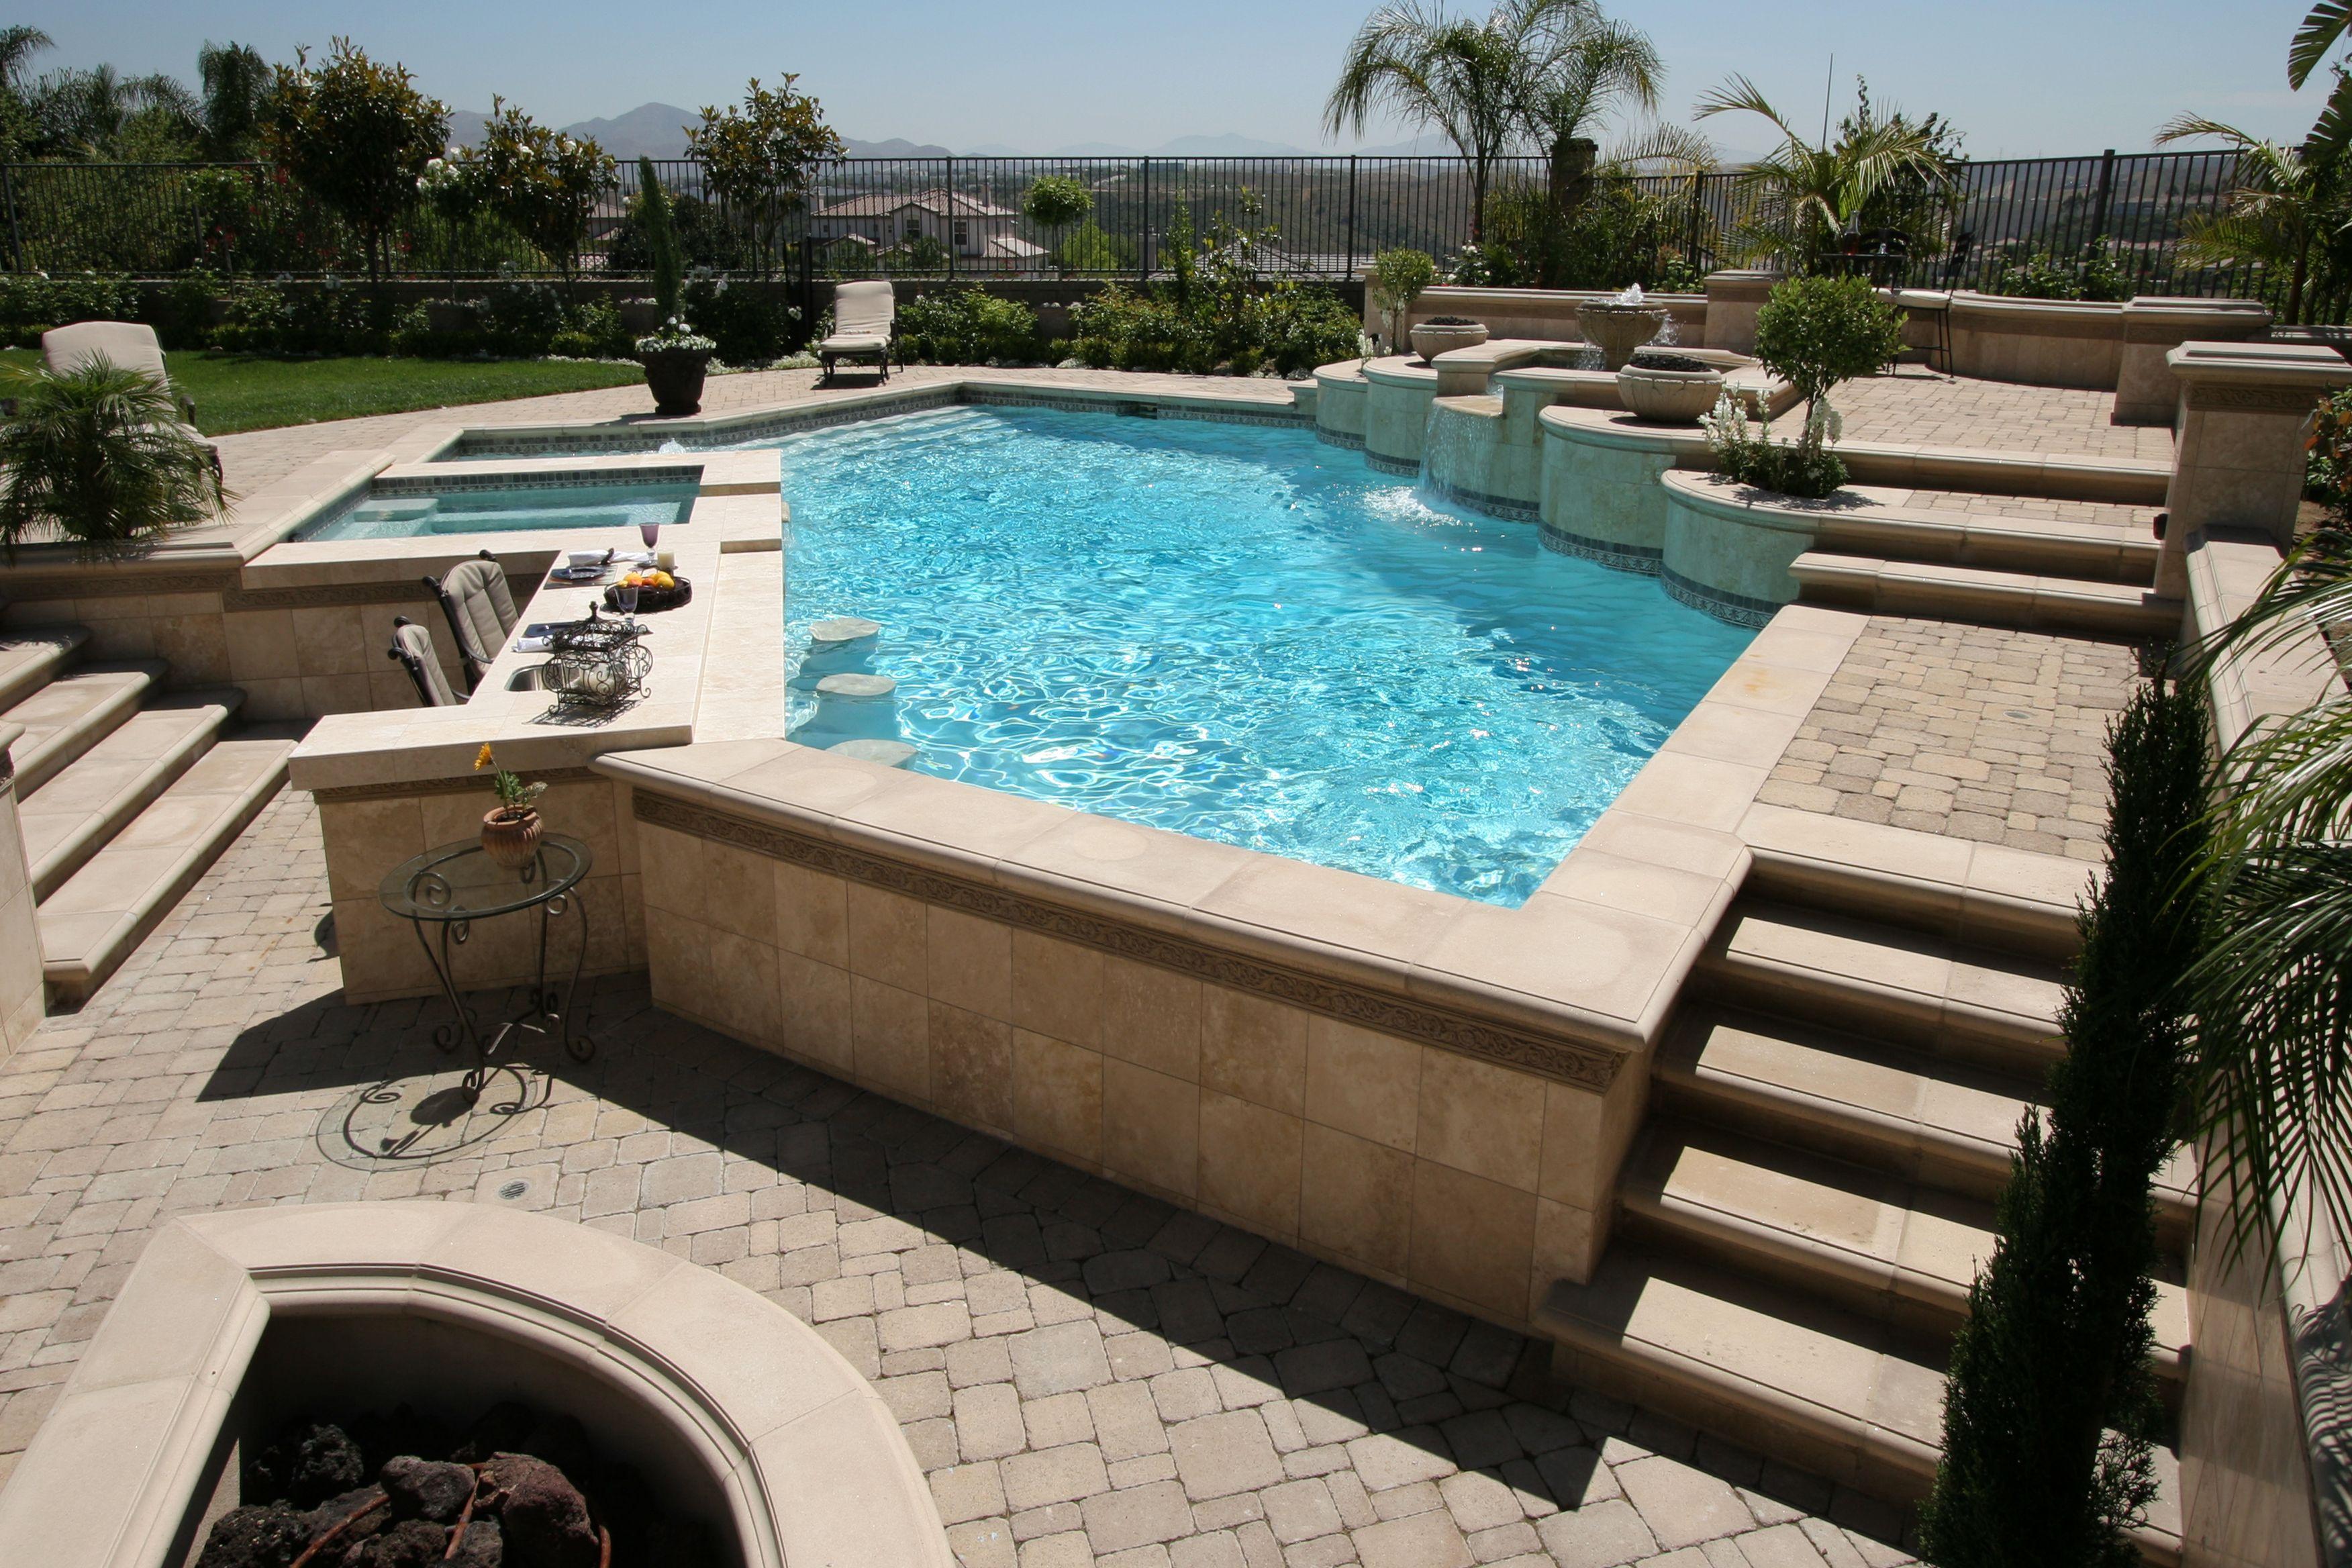 Mission Pools Serving Riverside, Orange County & San Diego Counties ...